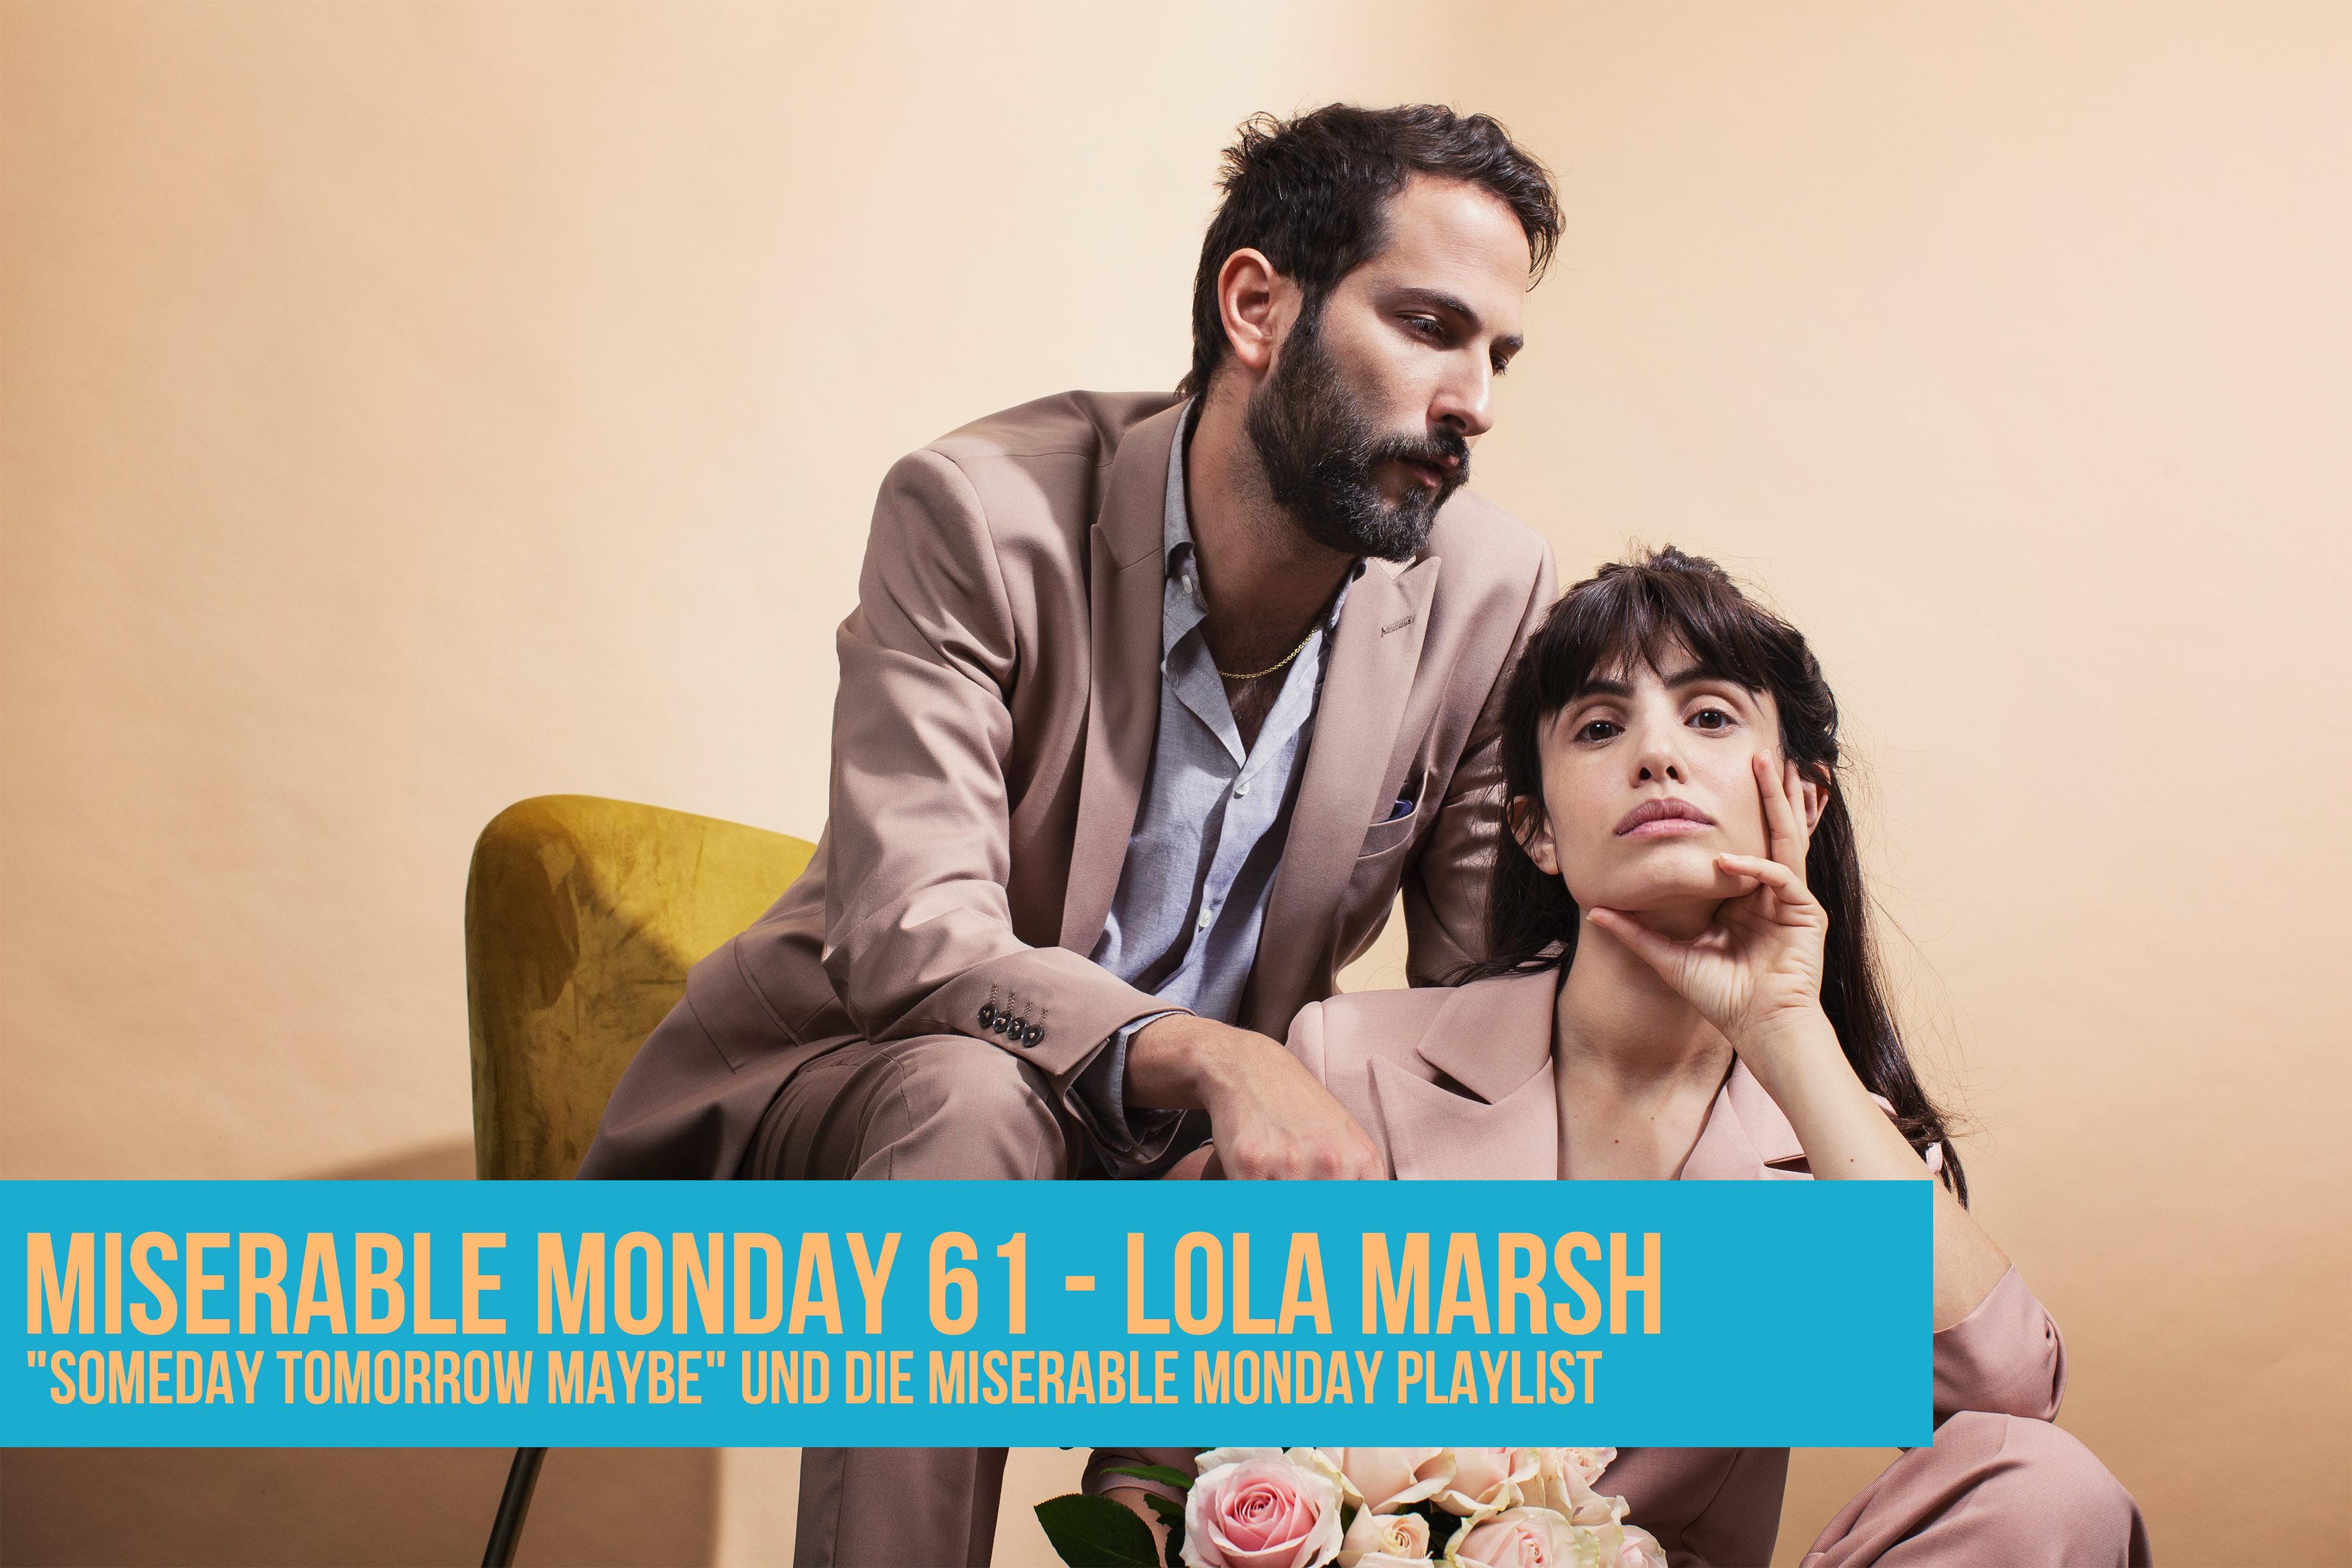 61 - Lola Marsh